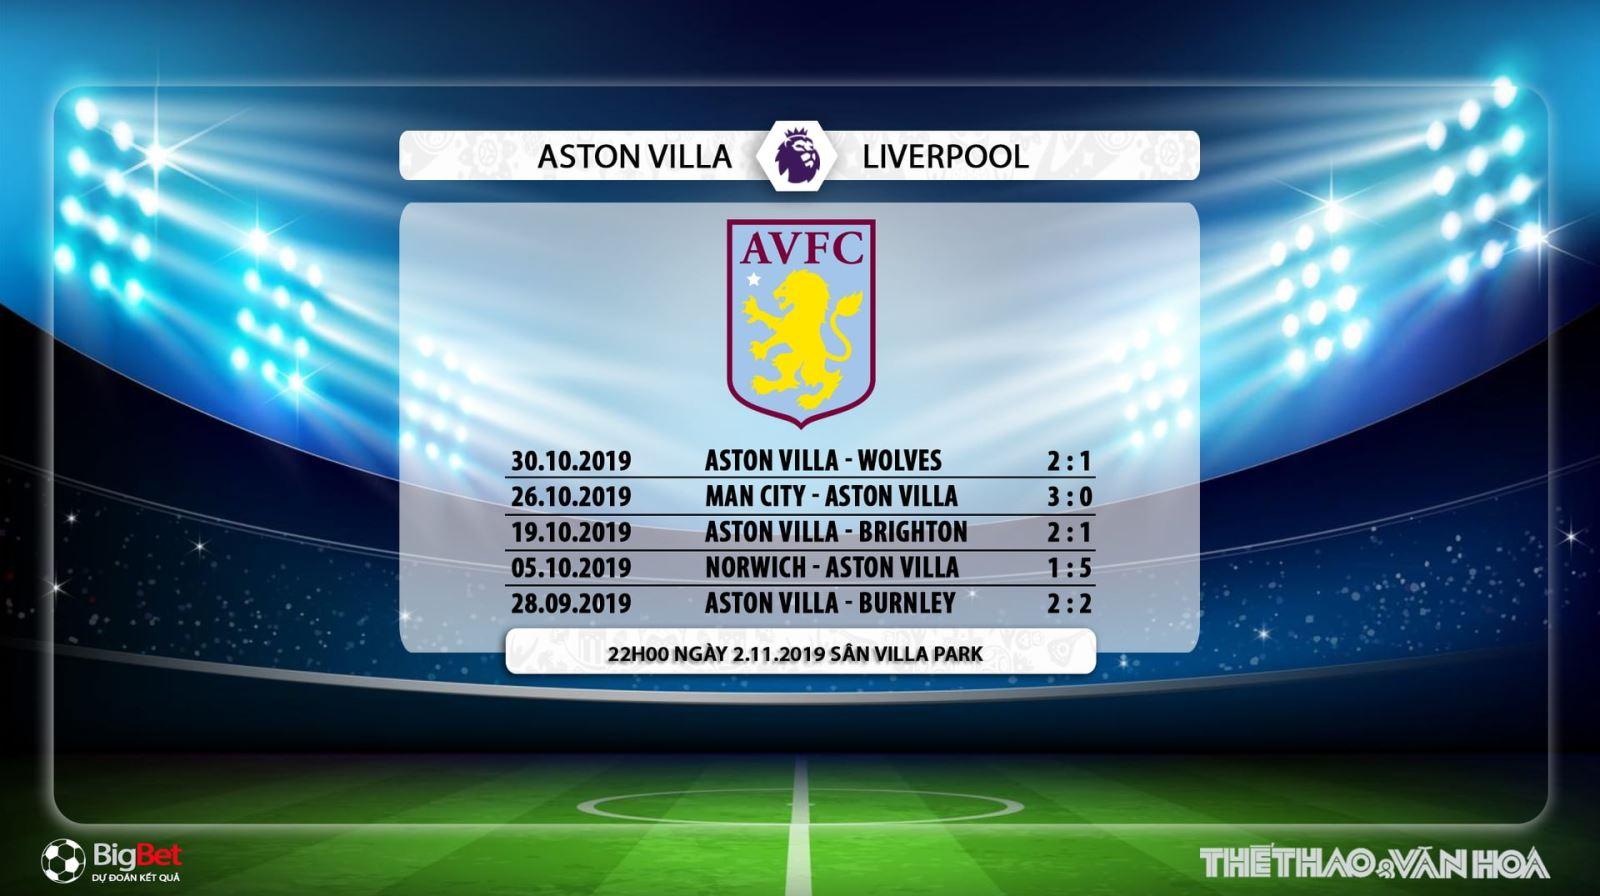 soi kèo Aston Villa vs Liverpool, Aston Villa vs Liverpool, trực tiếp bóng đá Aston Villa vs Liverpool, Liverpool, Aston Villa, nhận định bóng đá, K+PC, K+PM